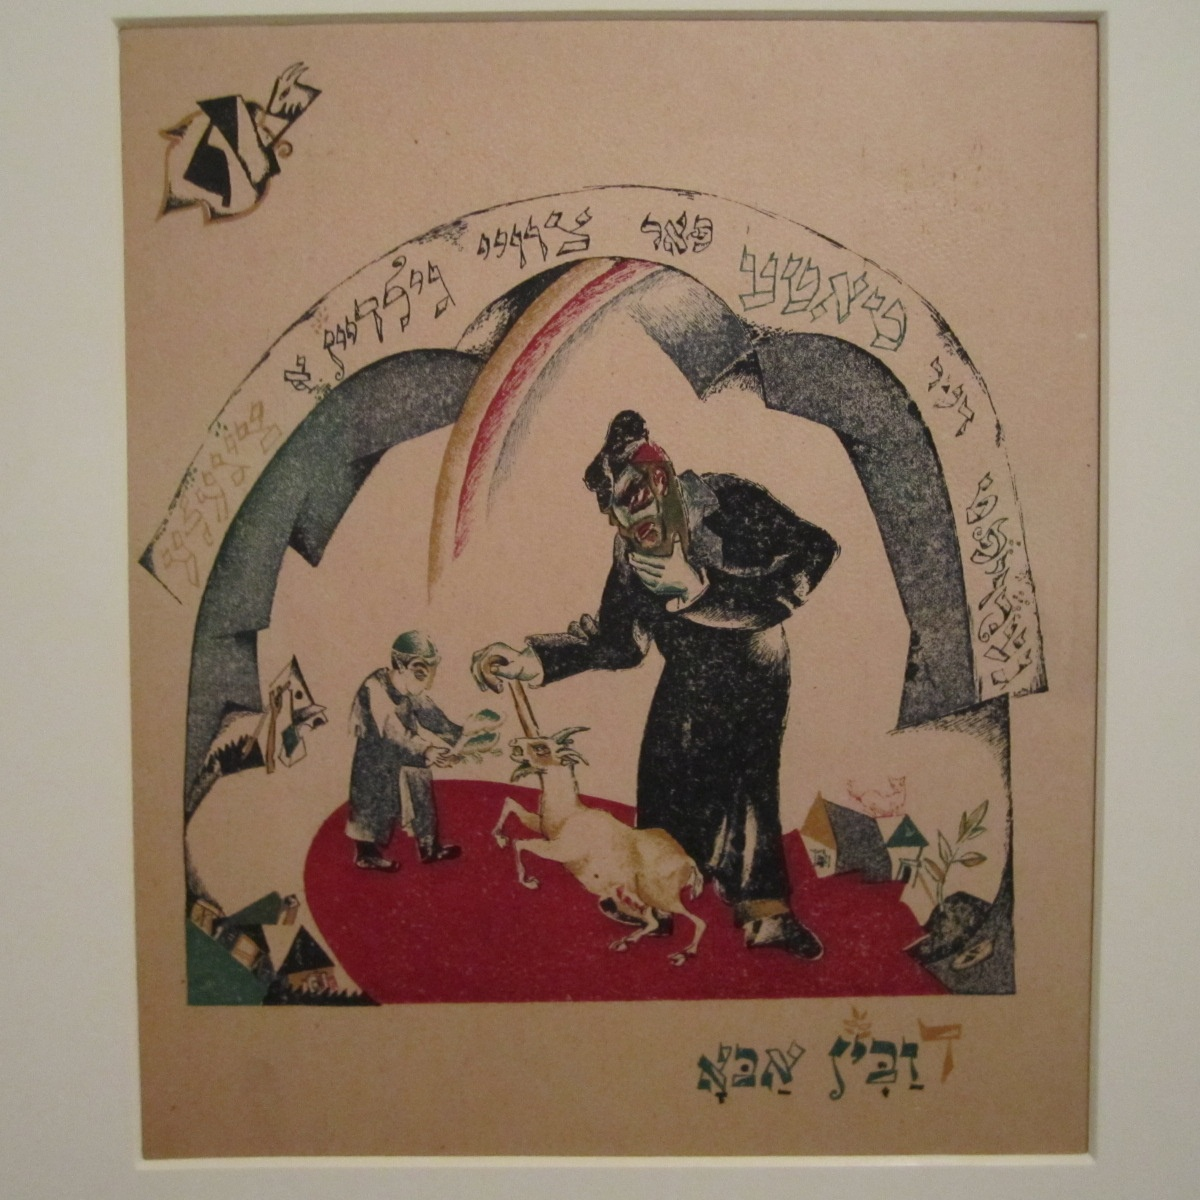 El Lissitzki - Khad Gadyo